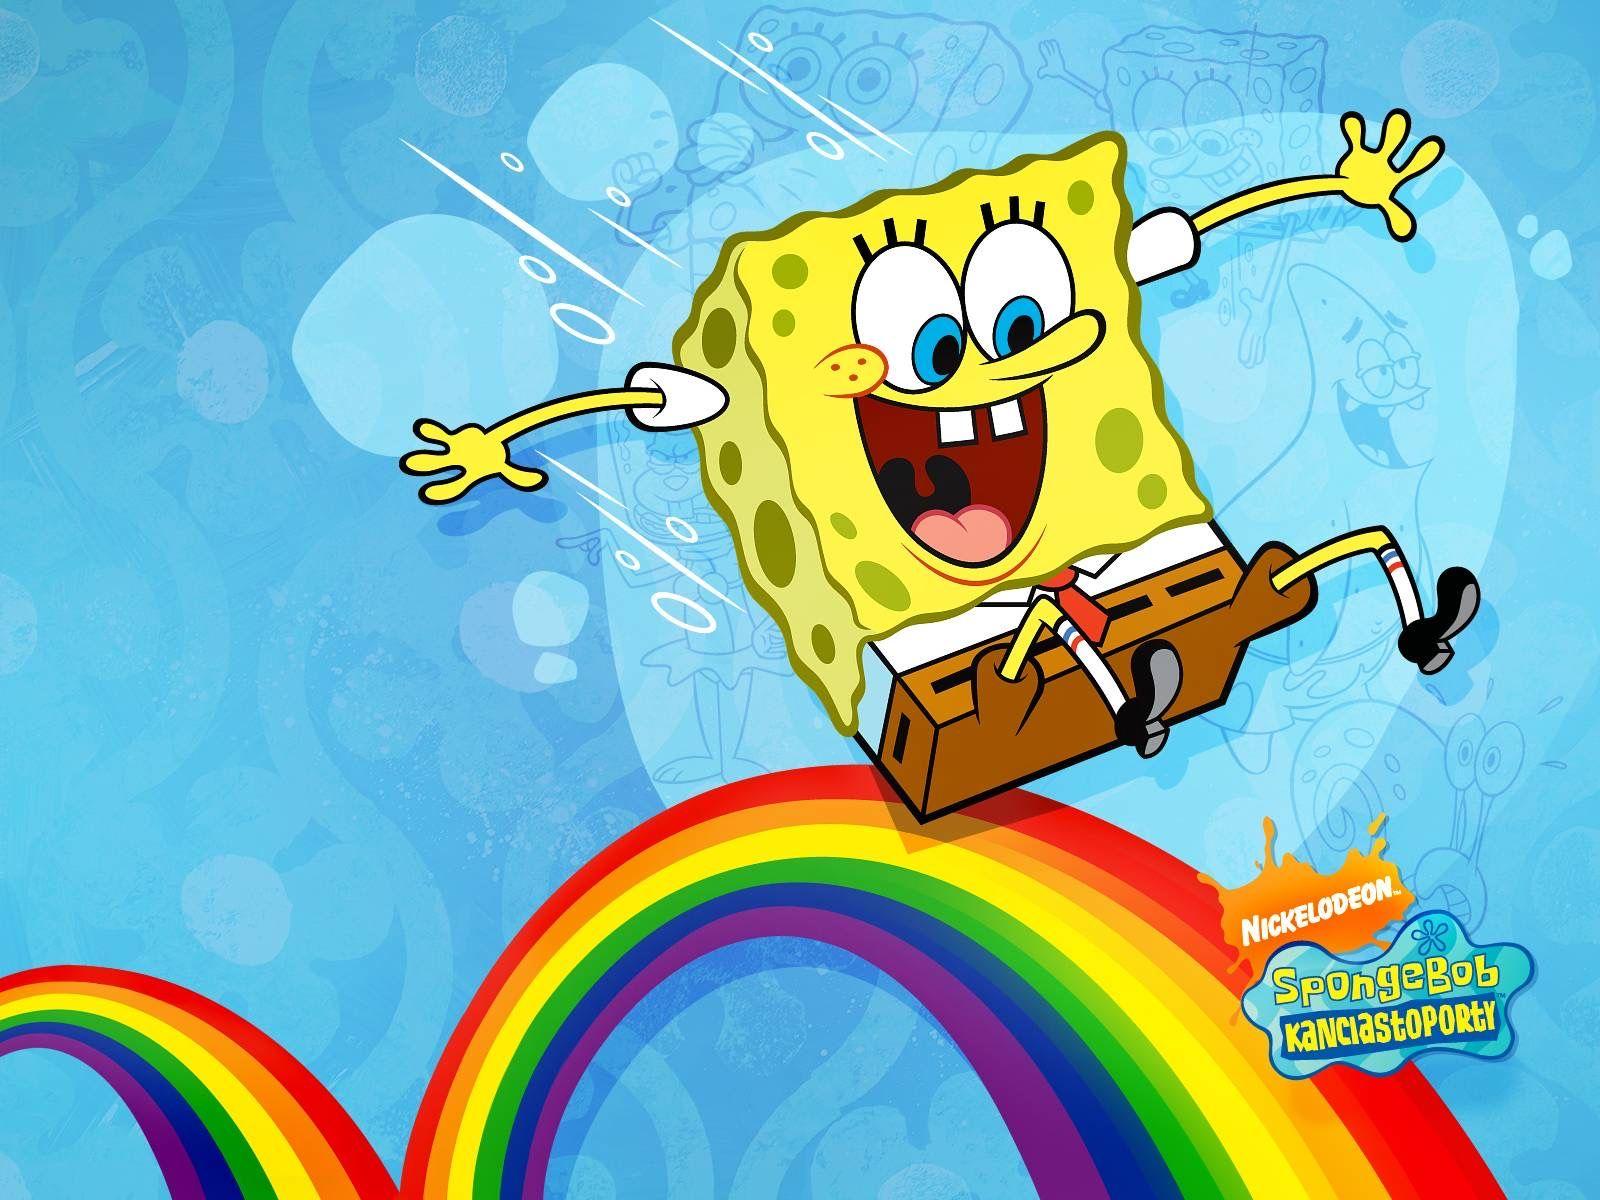 Pin by Rania💫 on SpongeBob Spongebob square, Spongebob